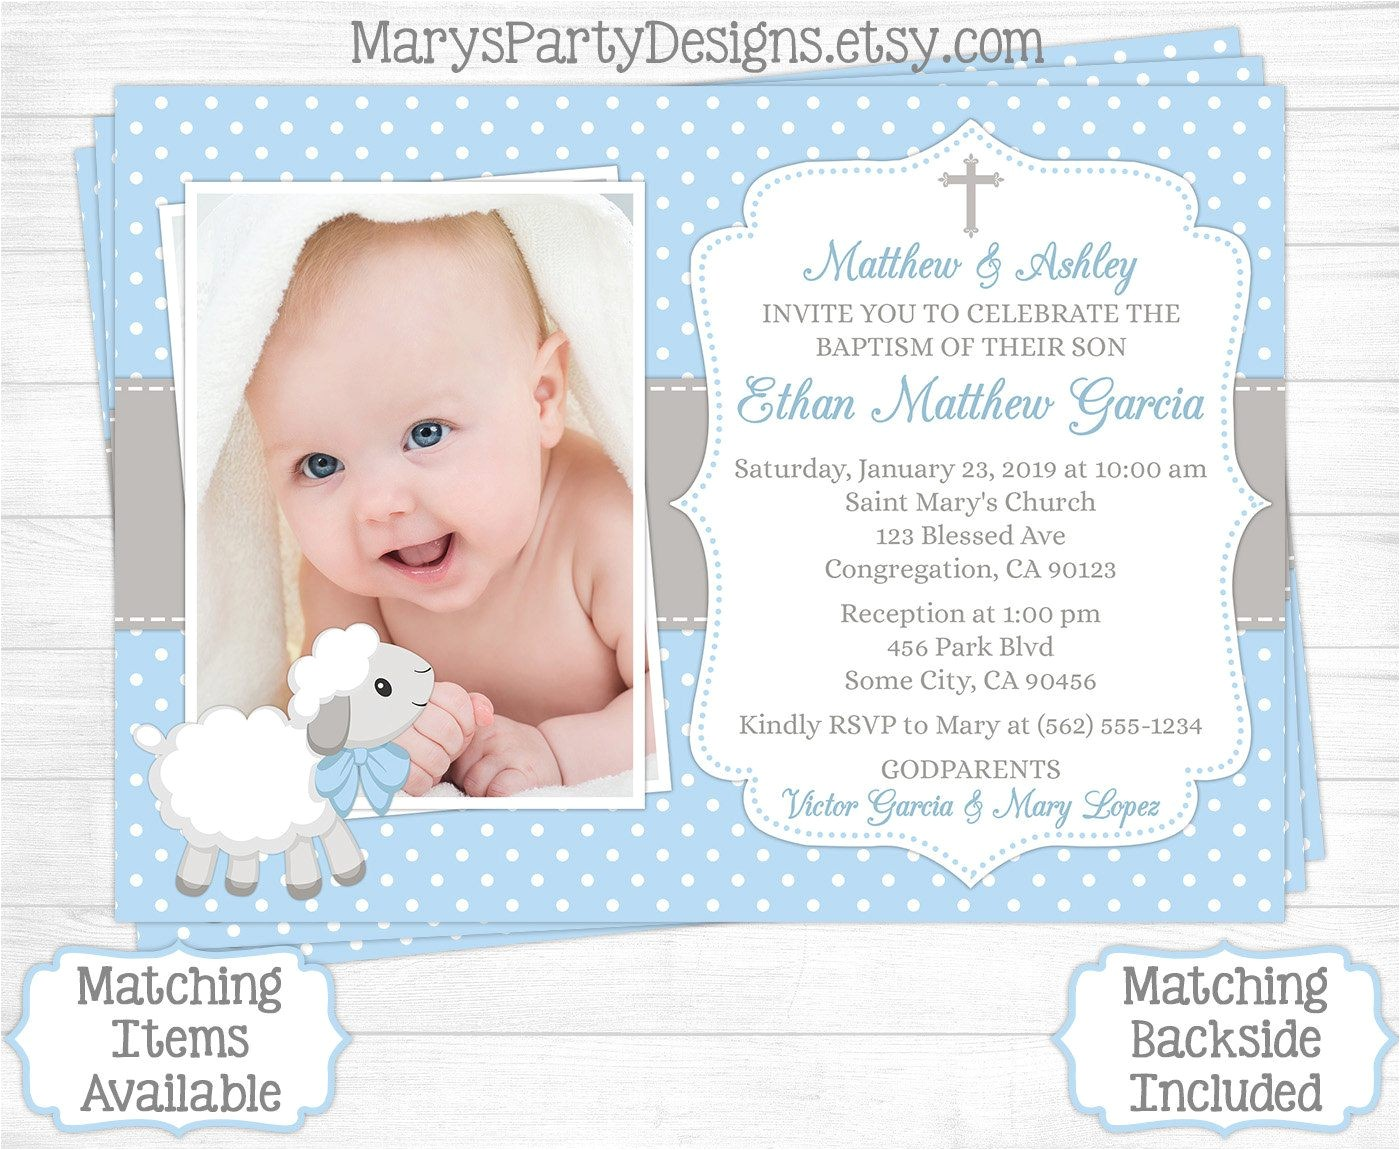 christening invitations for baby girl